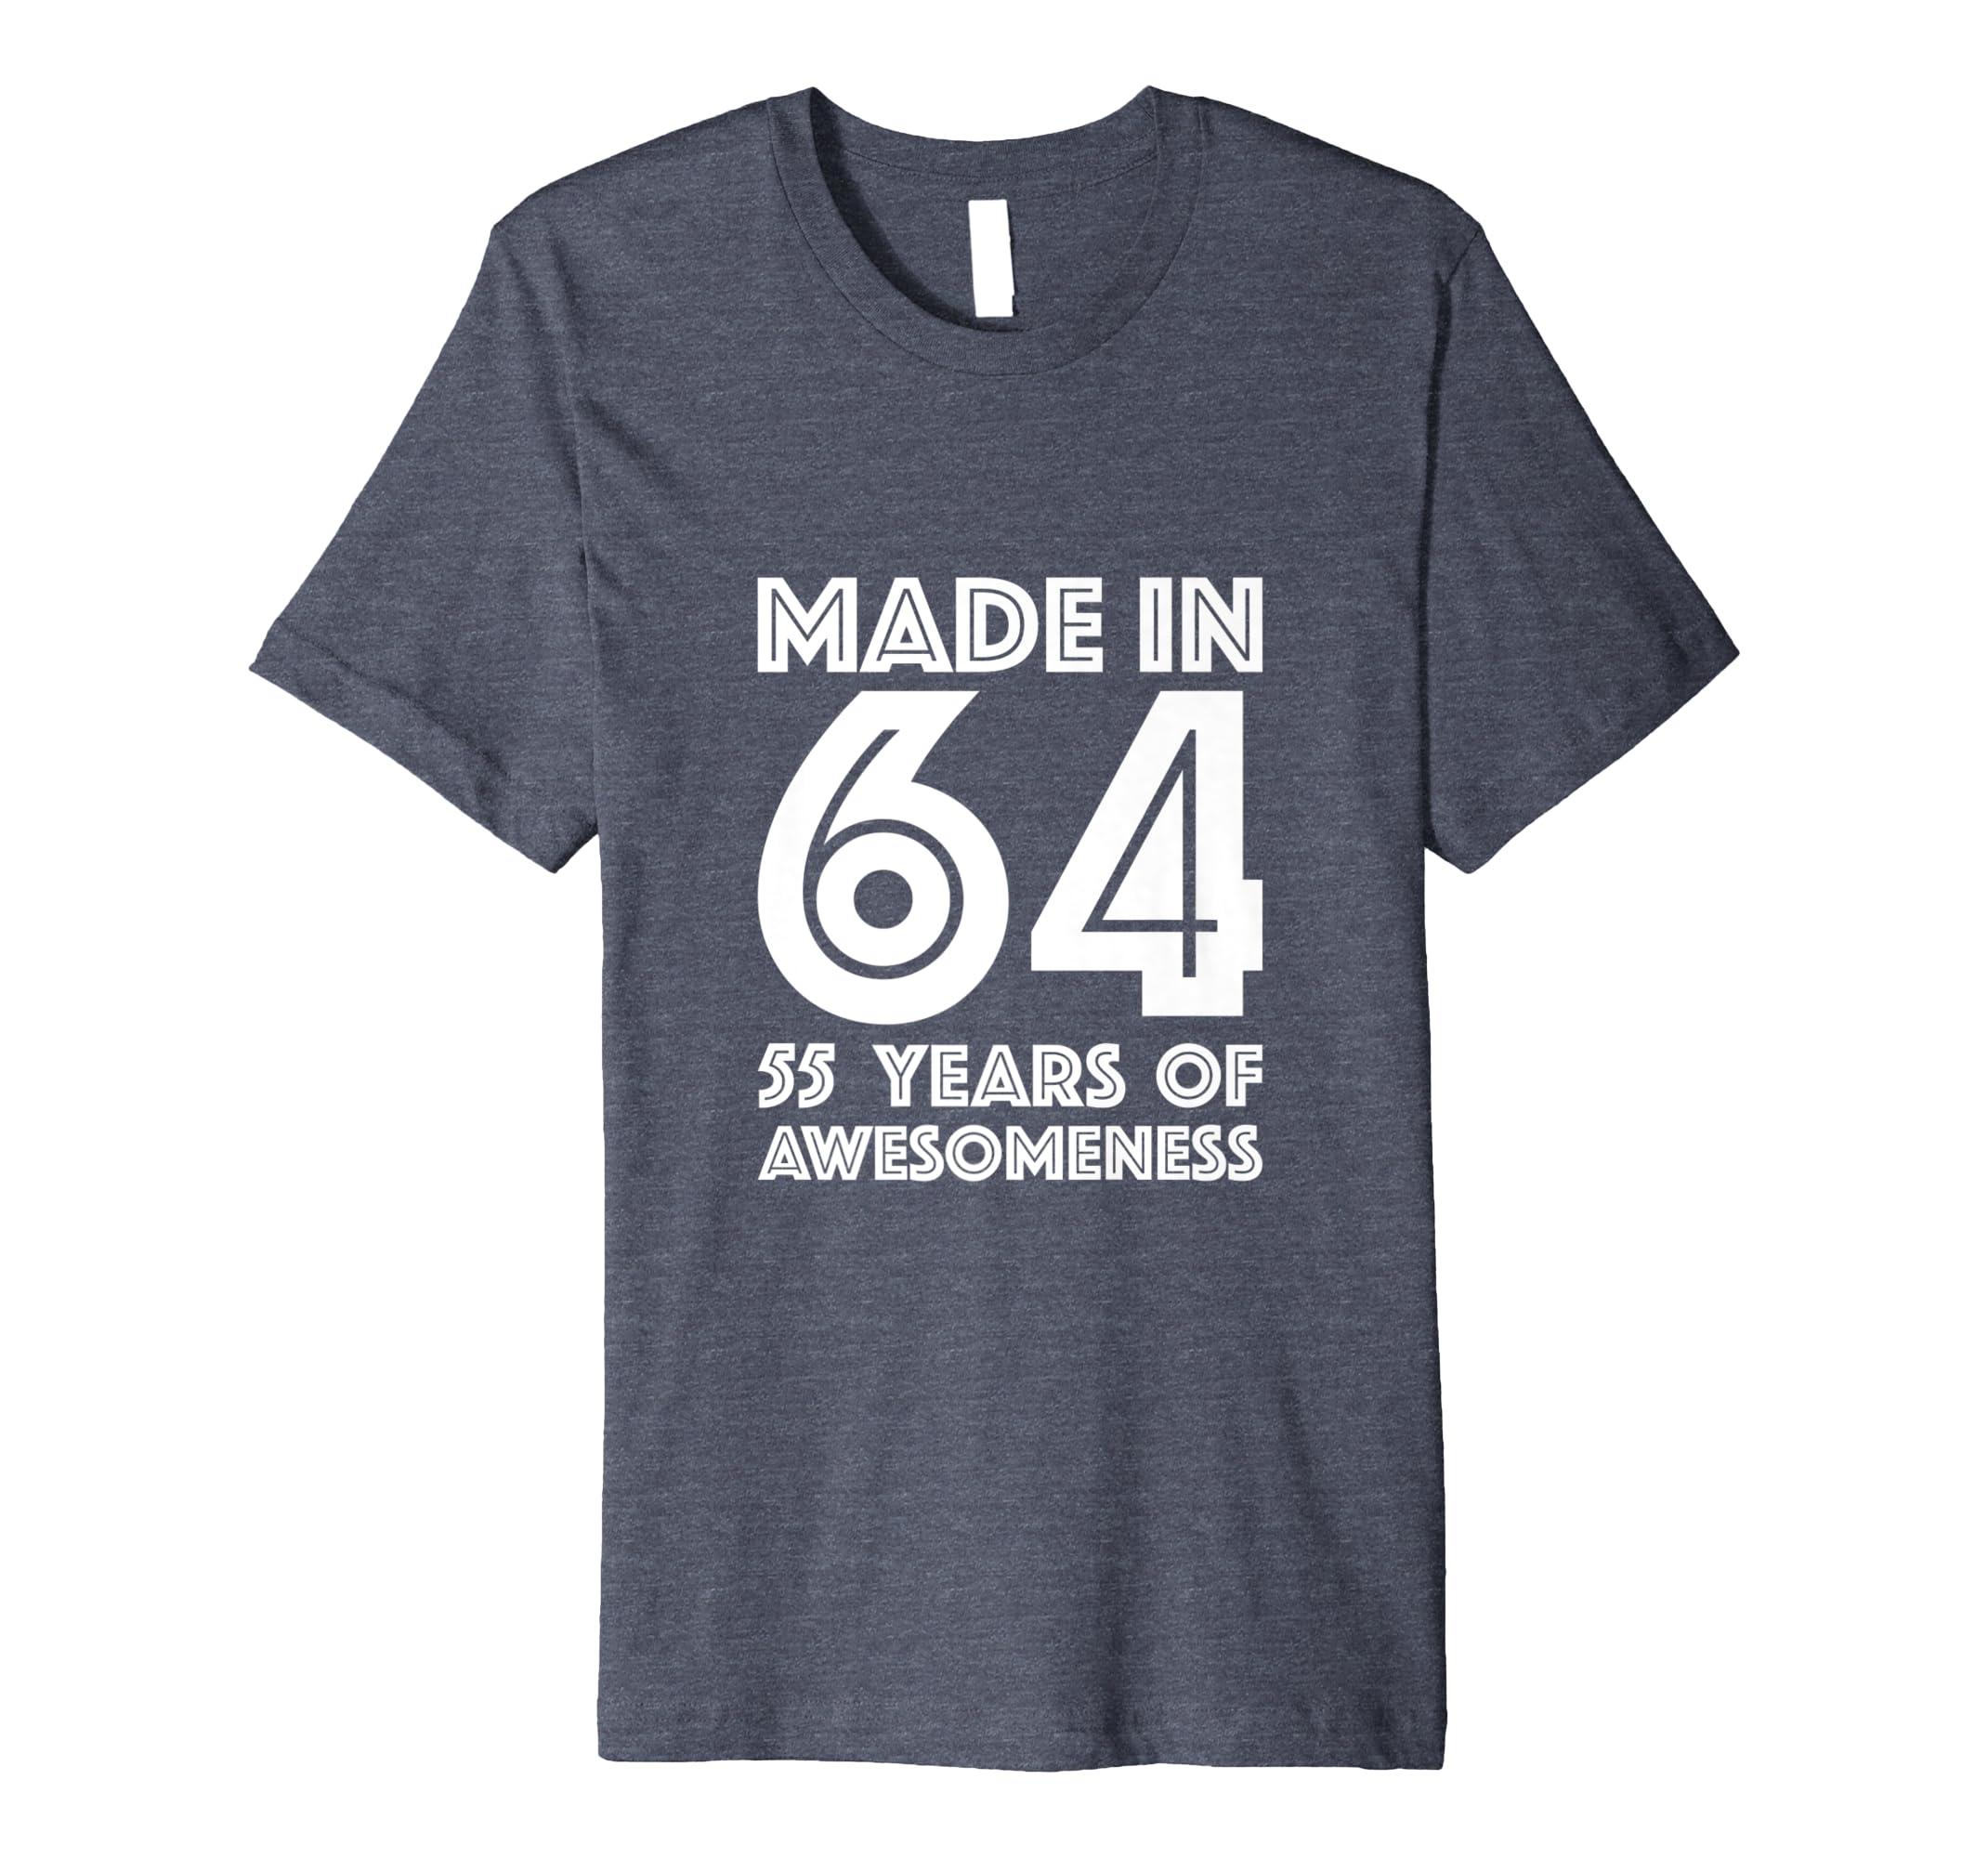 Amazon 55th Birthday Tshirt For Grandpa Men Gifts 55 Year Old Dad Clothing